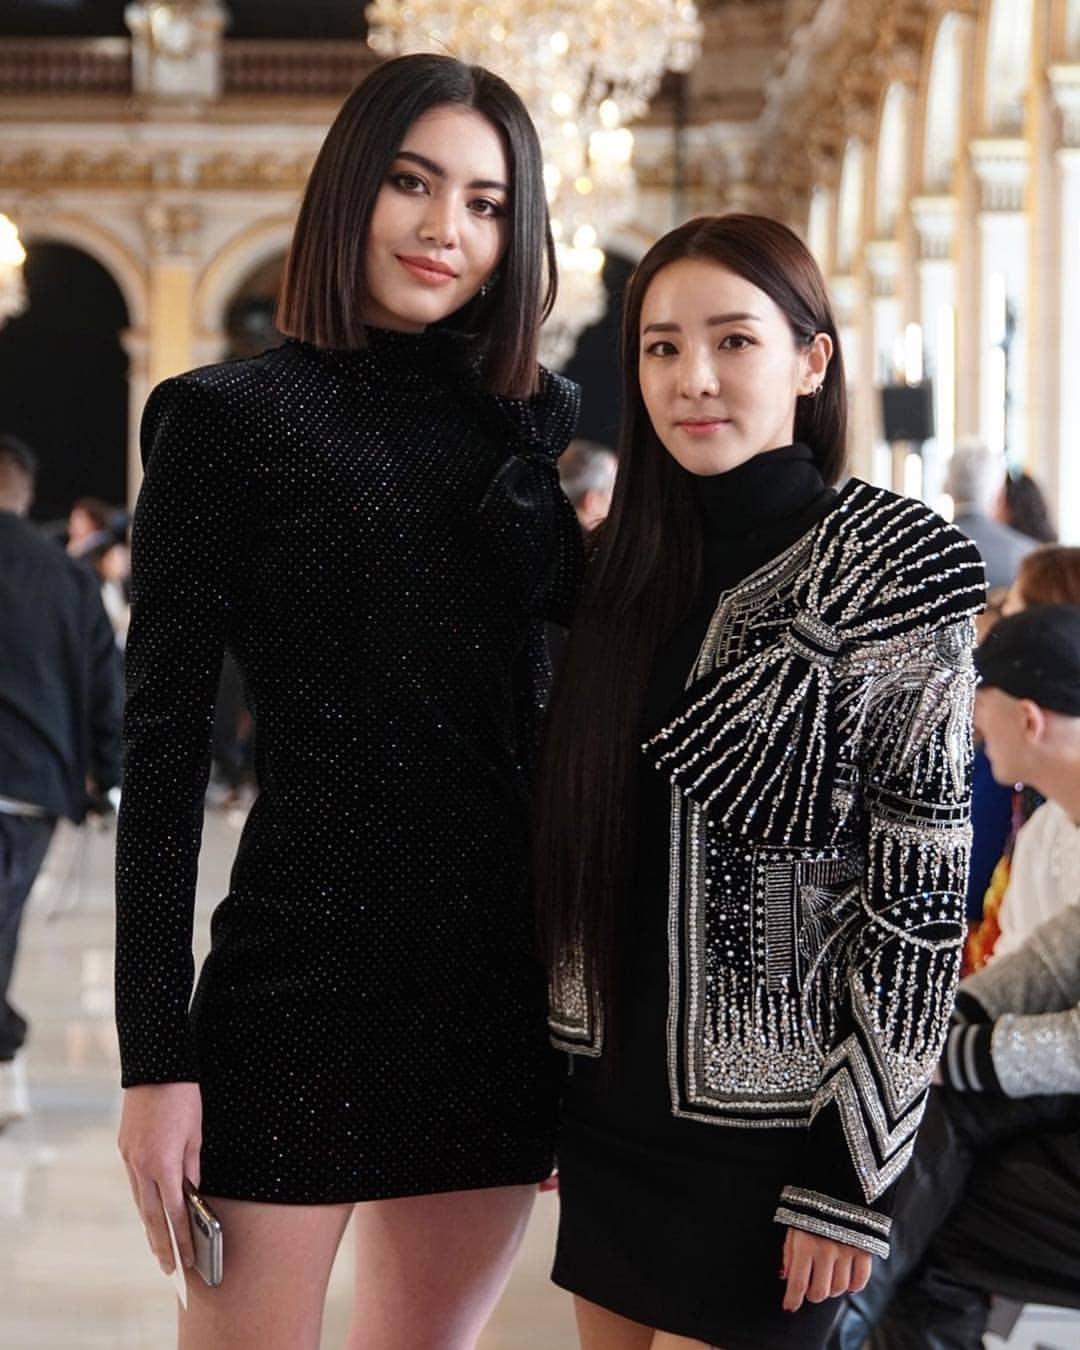 sao quốc tế tại tuần lễ thời trang paris 2019 11